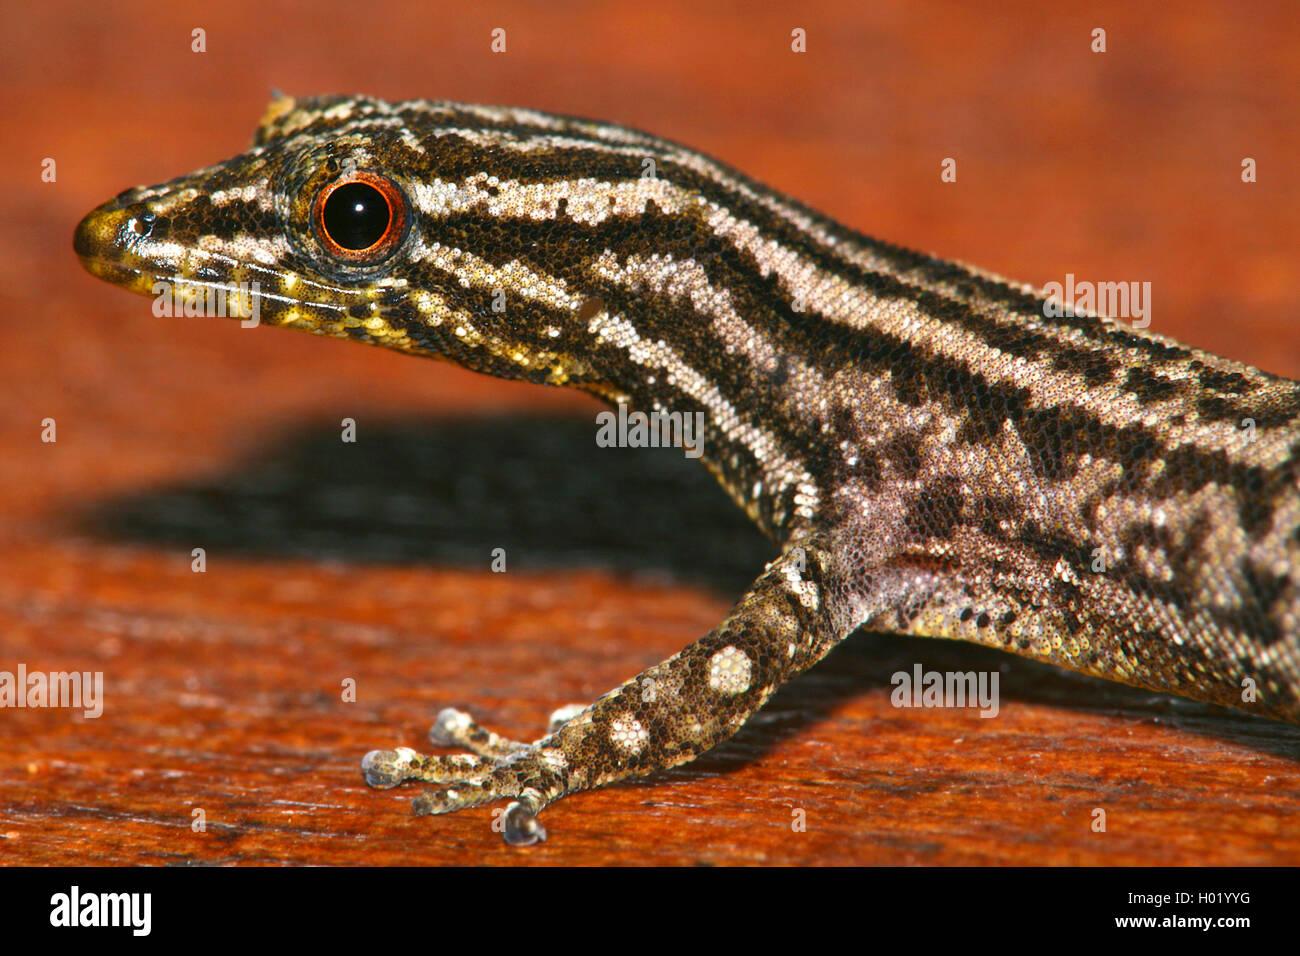 Marked-Throated Pigmy Gecko (Sphaerodactylus graptolaemus), Portrait, Costa Rica Stock Photo